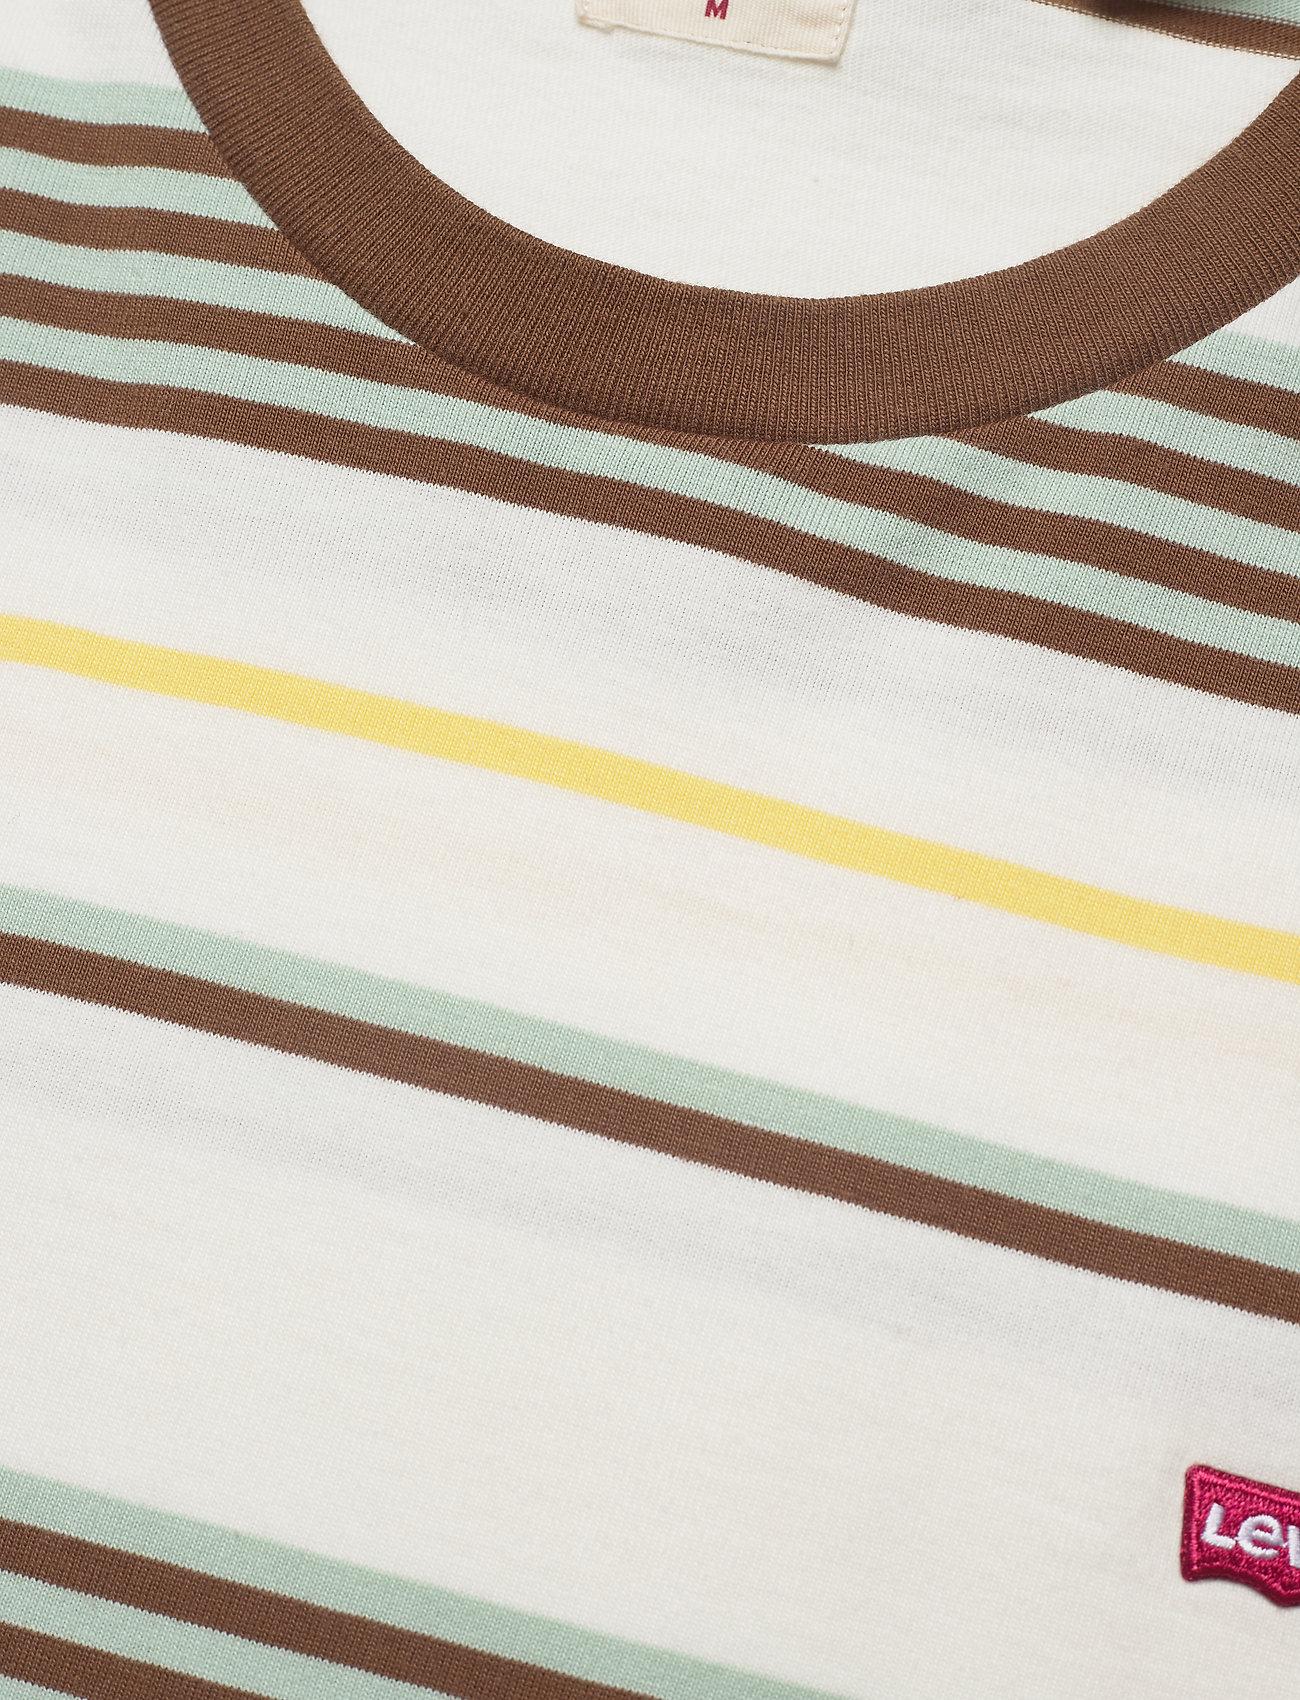 Ss Original Hm Tee Bright Stri (Multi-color) (249 kr) - LEVI´S Men